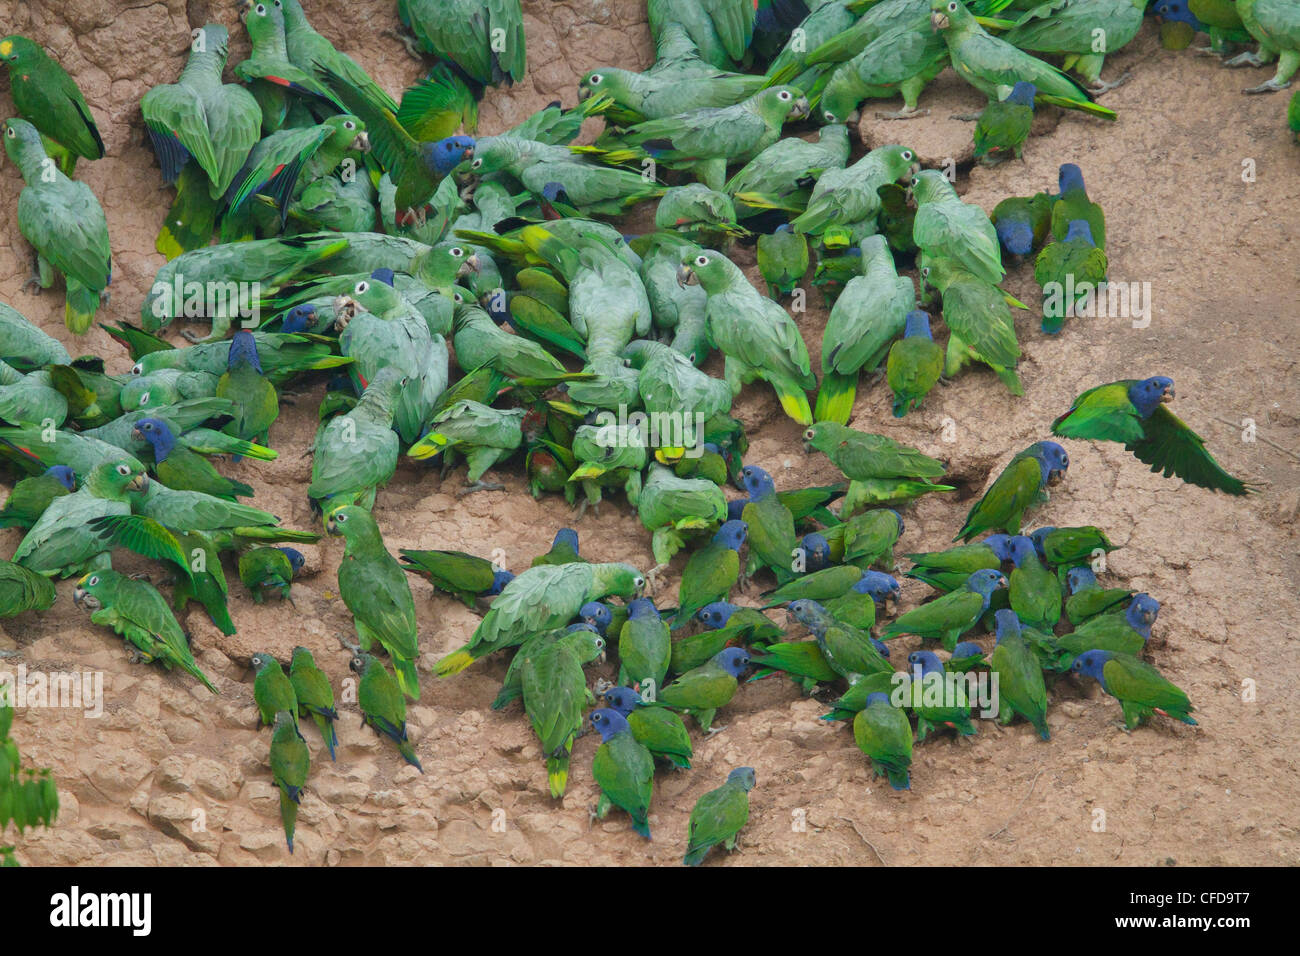 Blue-headed Parrot (Pionus menstruus) feeding at a clay lick in Amazonian Ecuador. - Stock Image